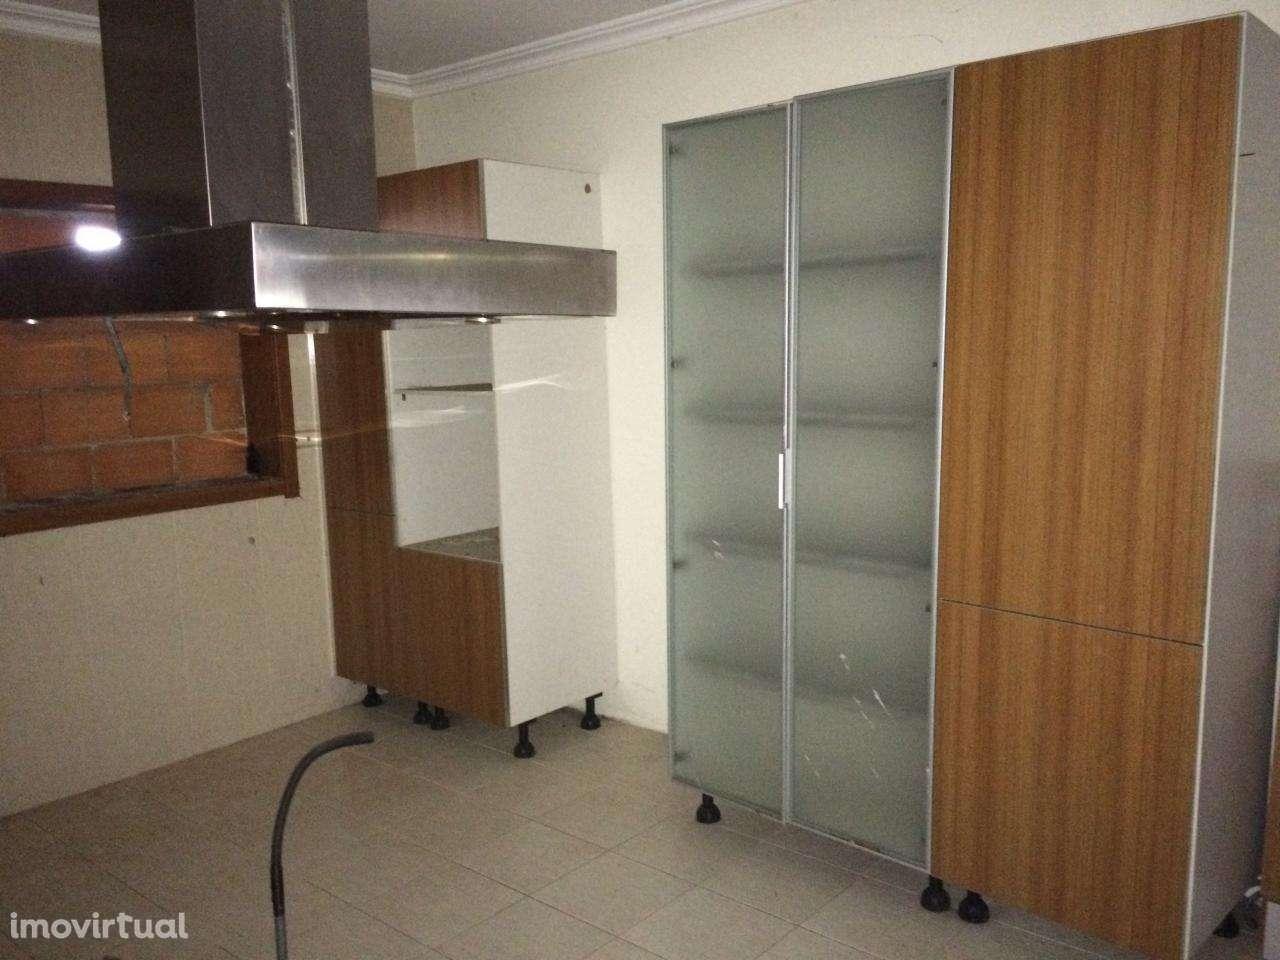 Moradia para comprar, Eixo e Eirol, Aveiro - Foto 6